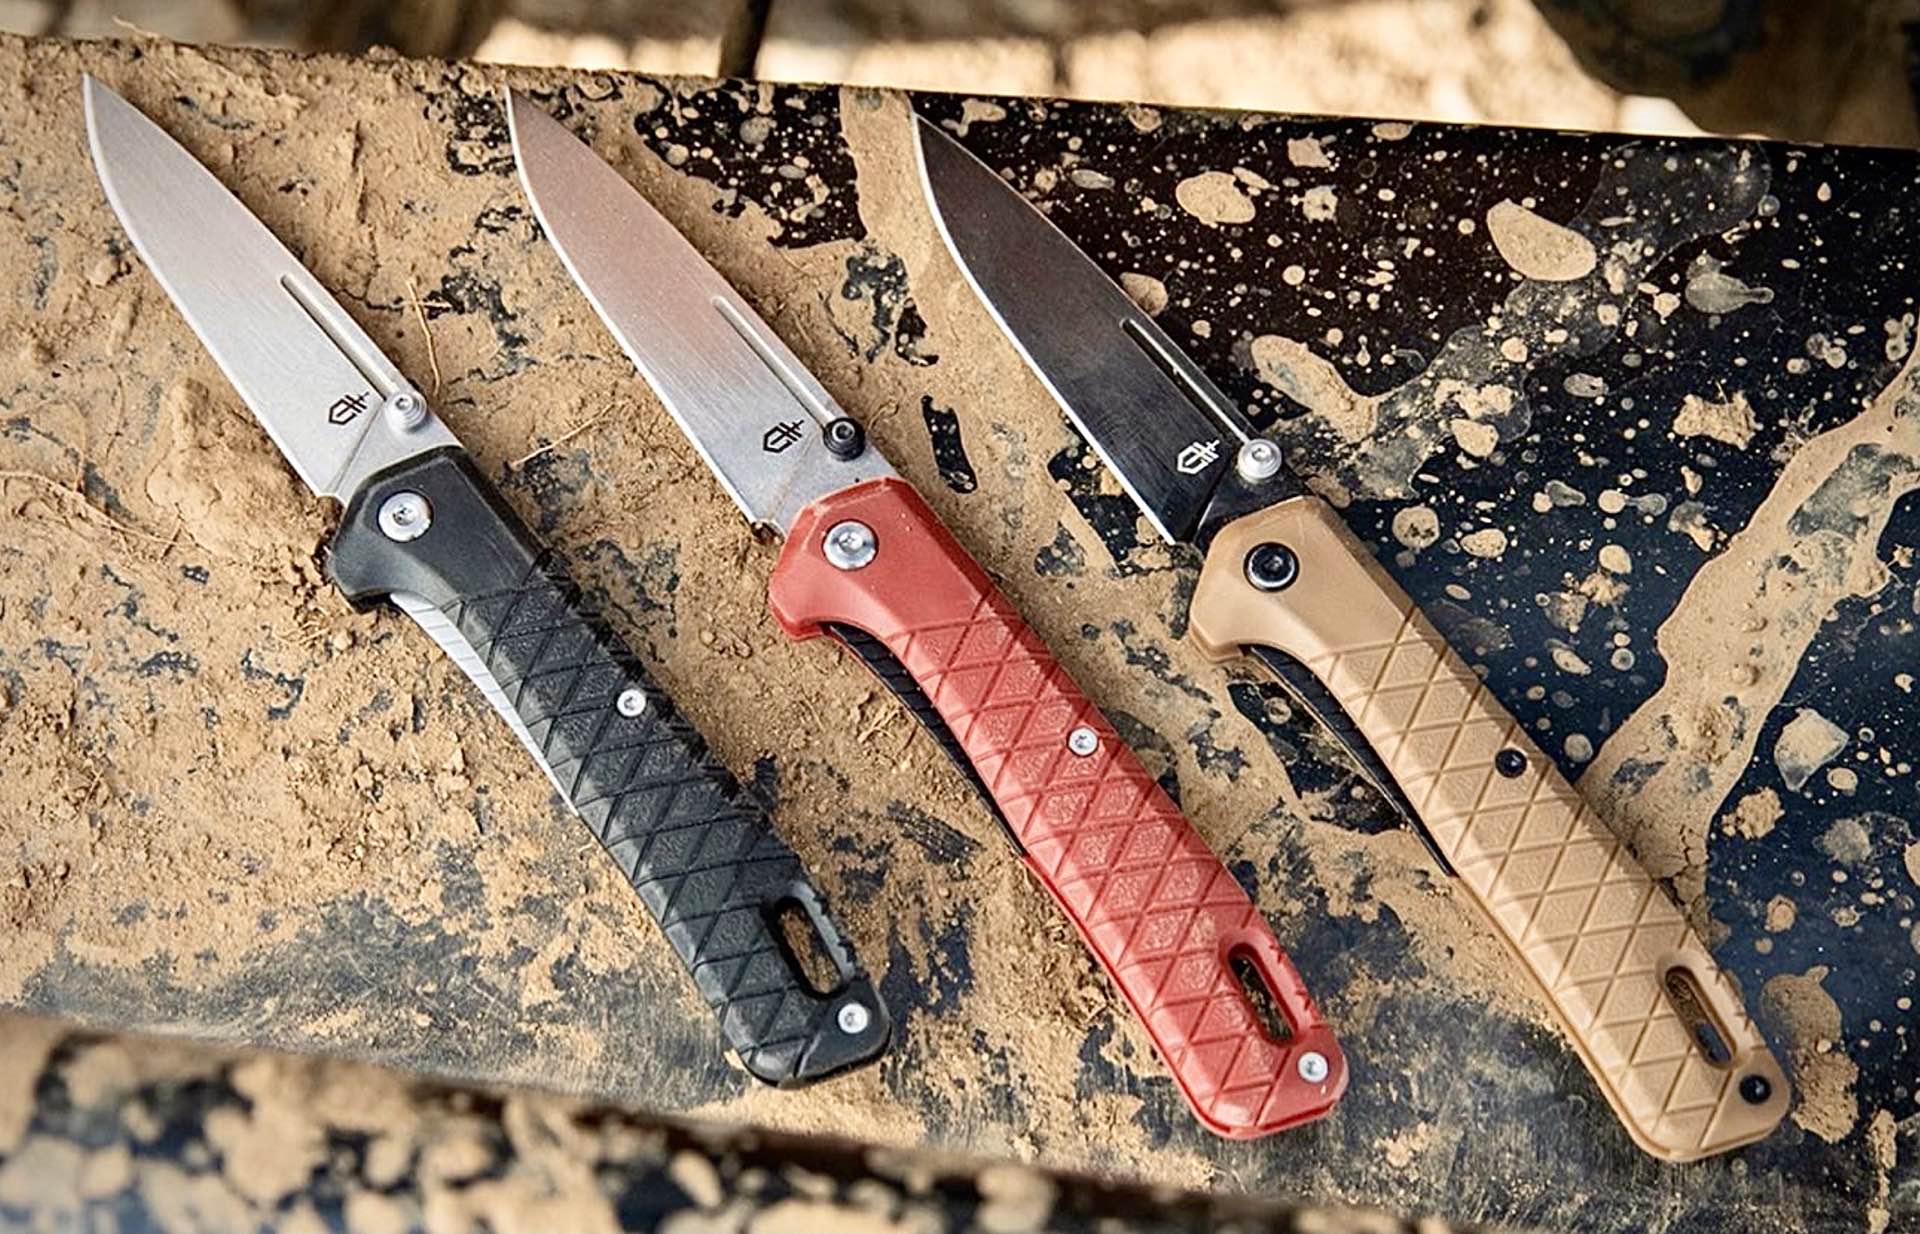 gerber-gear-zilch-pocket-folding-knife